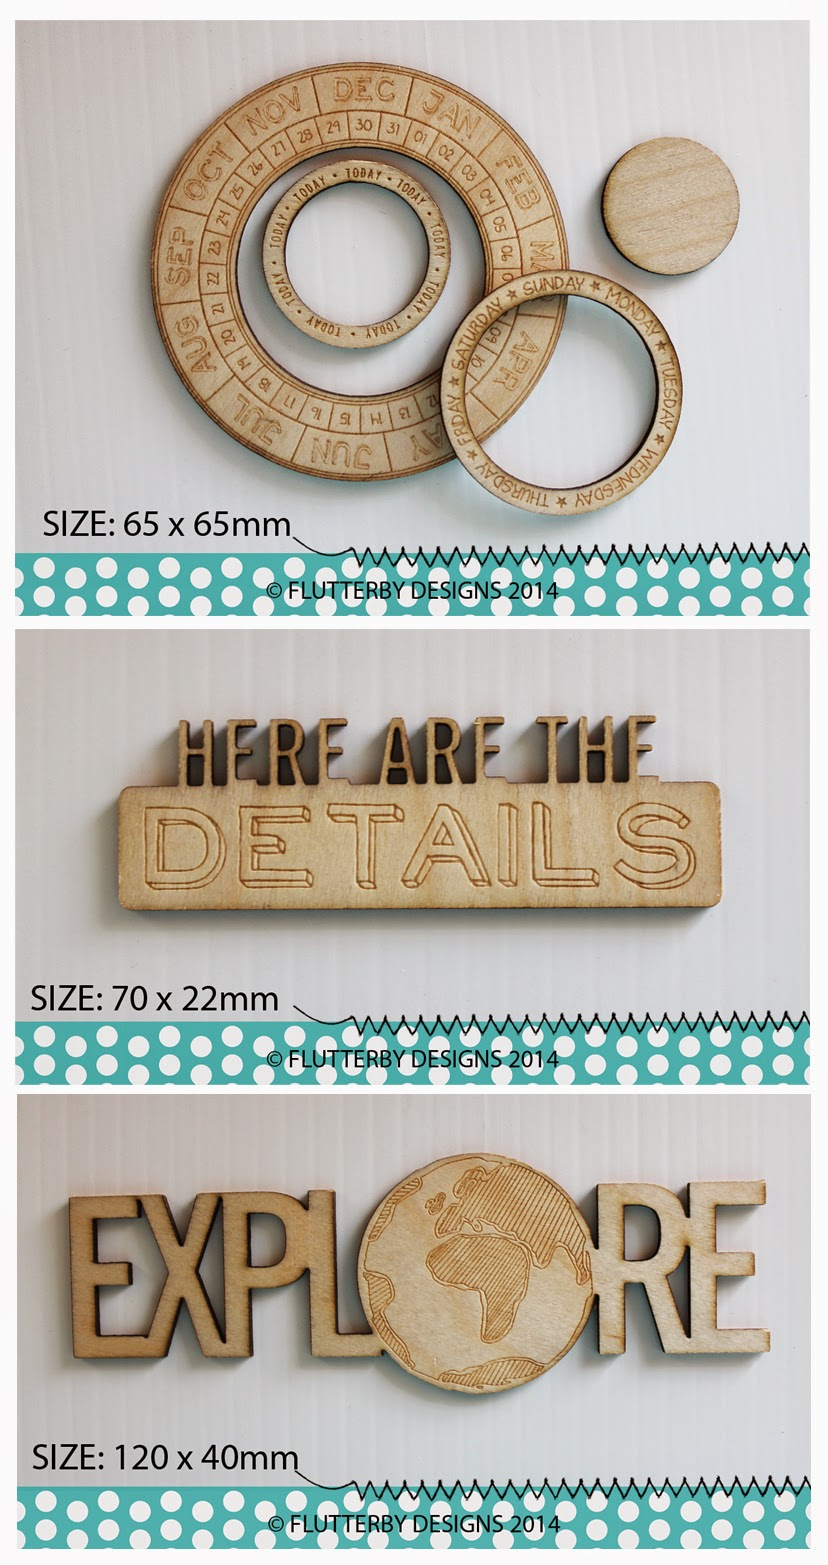 http://flutterbydesigns.bigcartel.com/product/wood-bits-wood-veneers-10